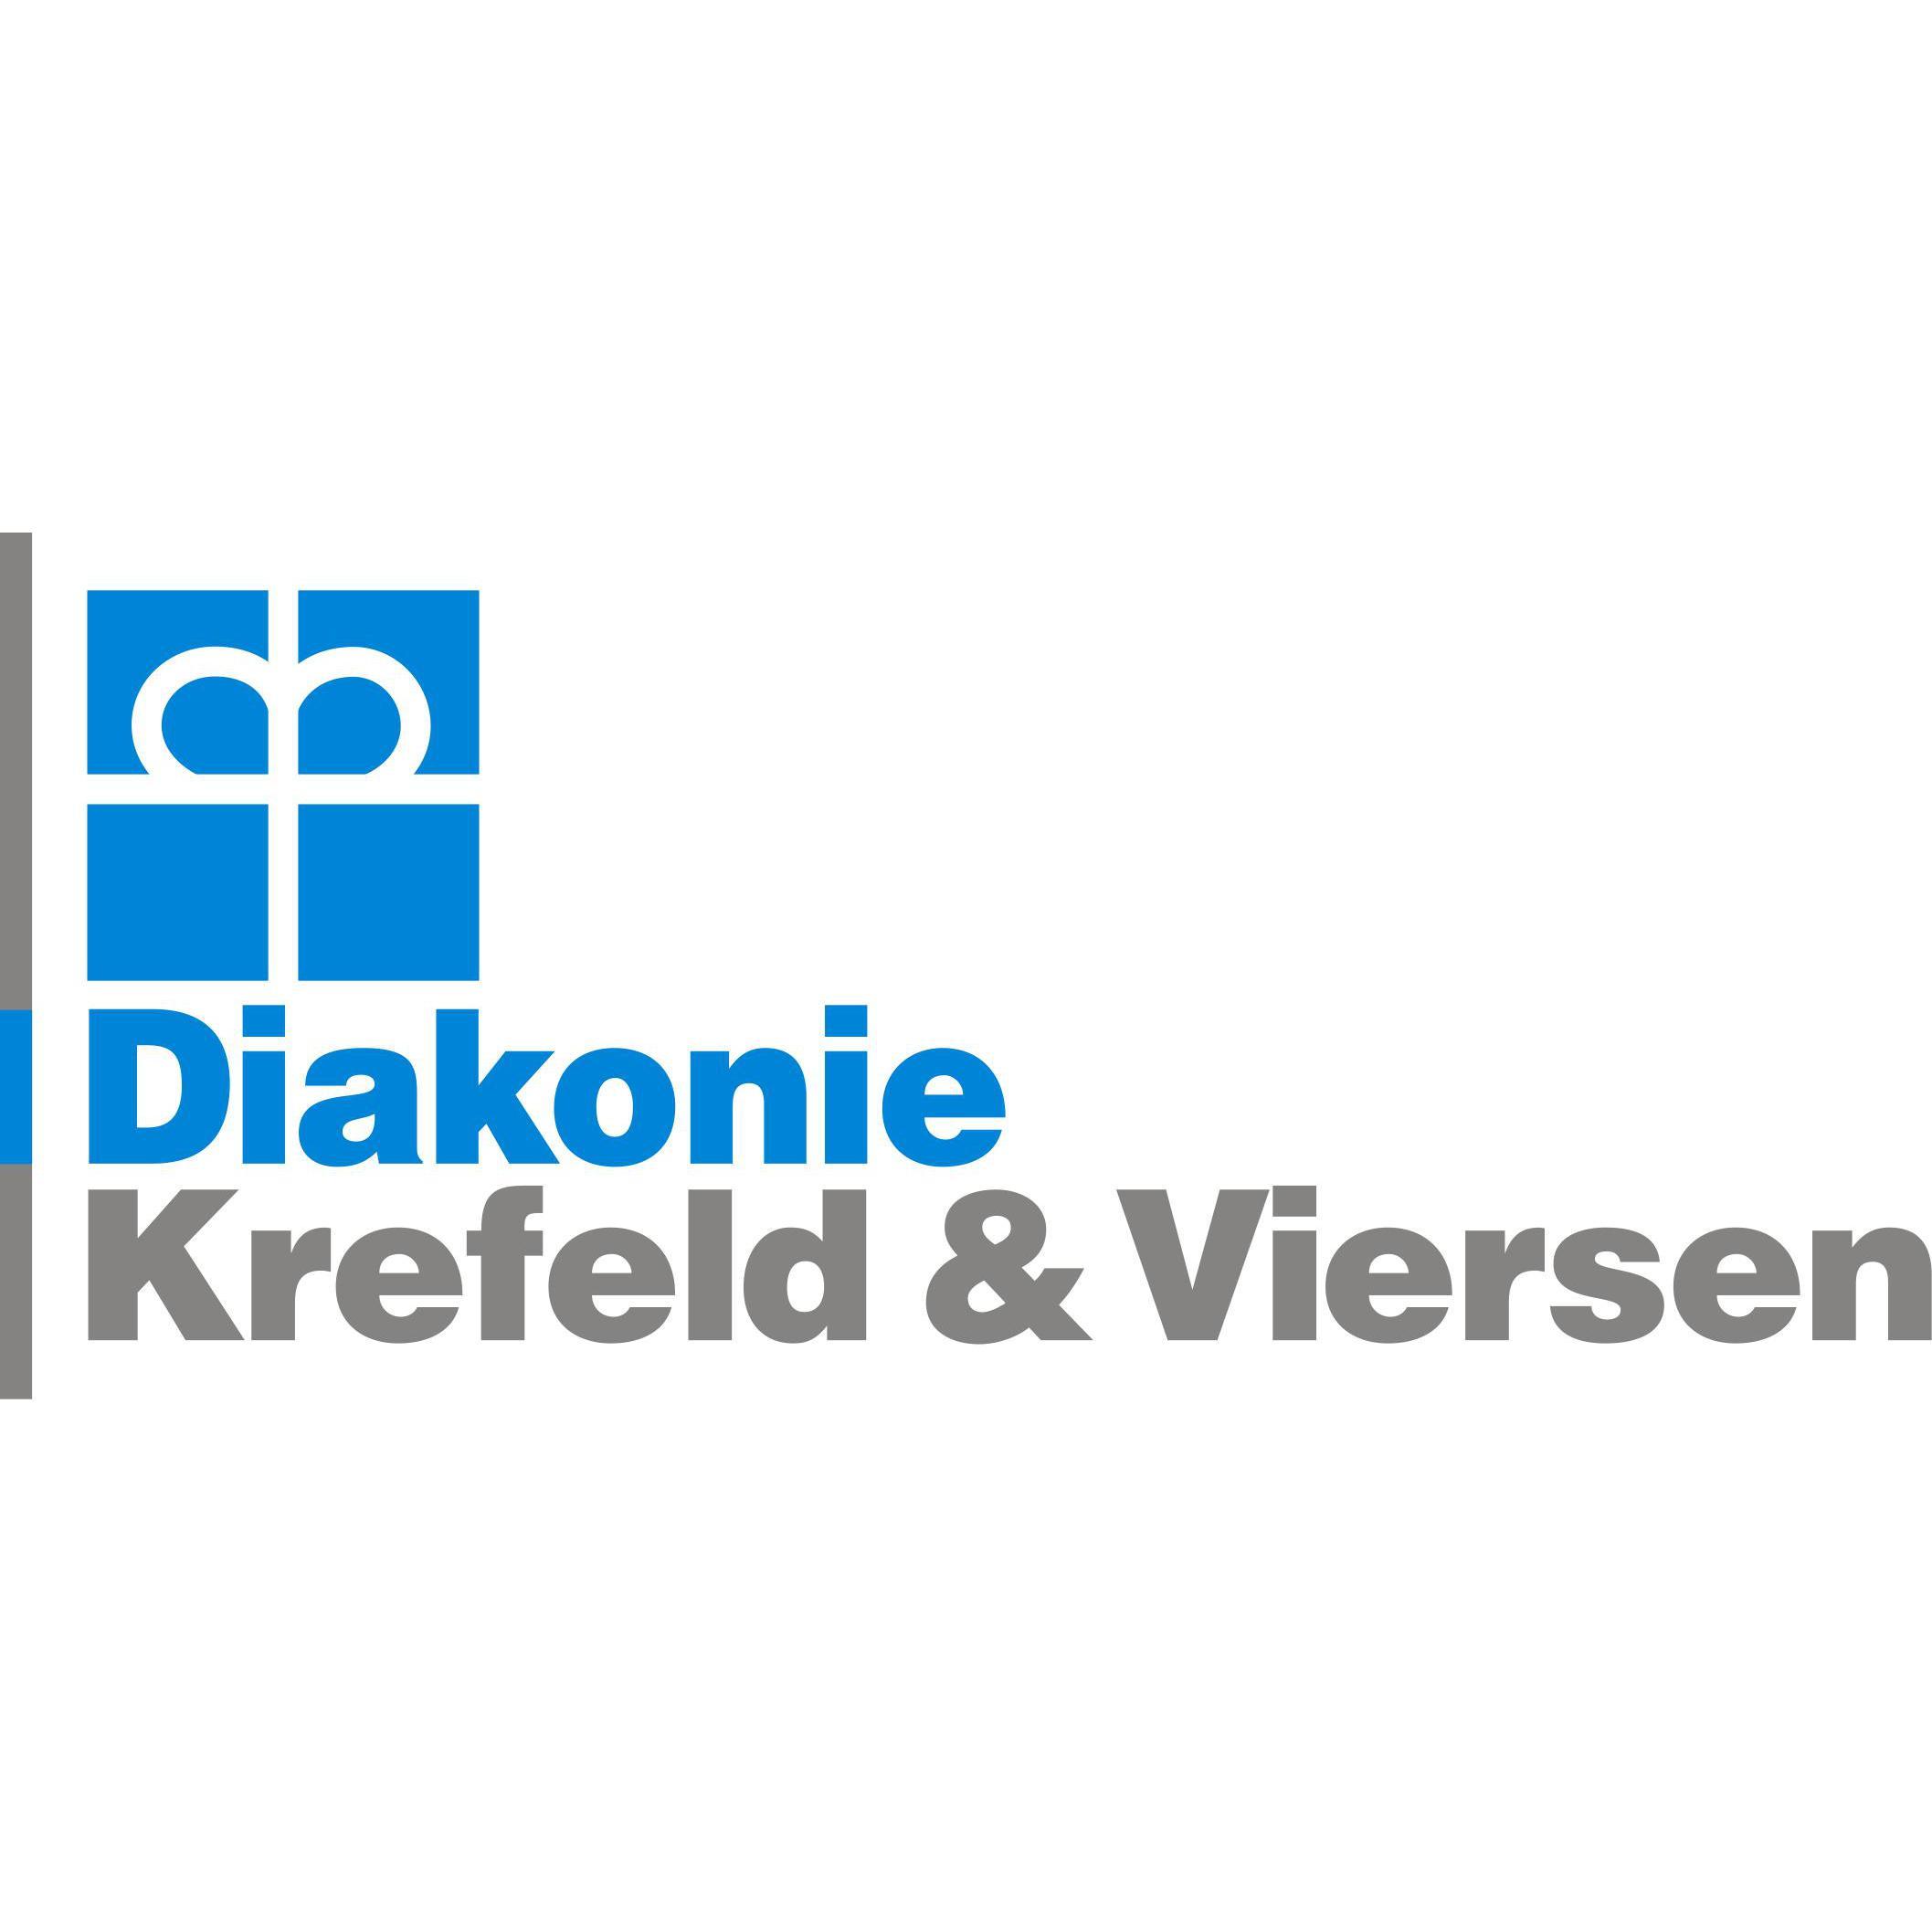 Diakonie Krefeld & Viersen